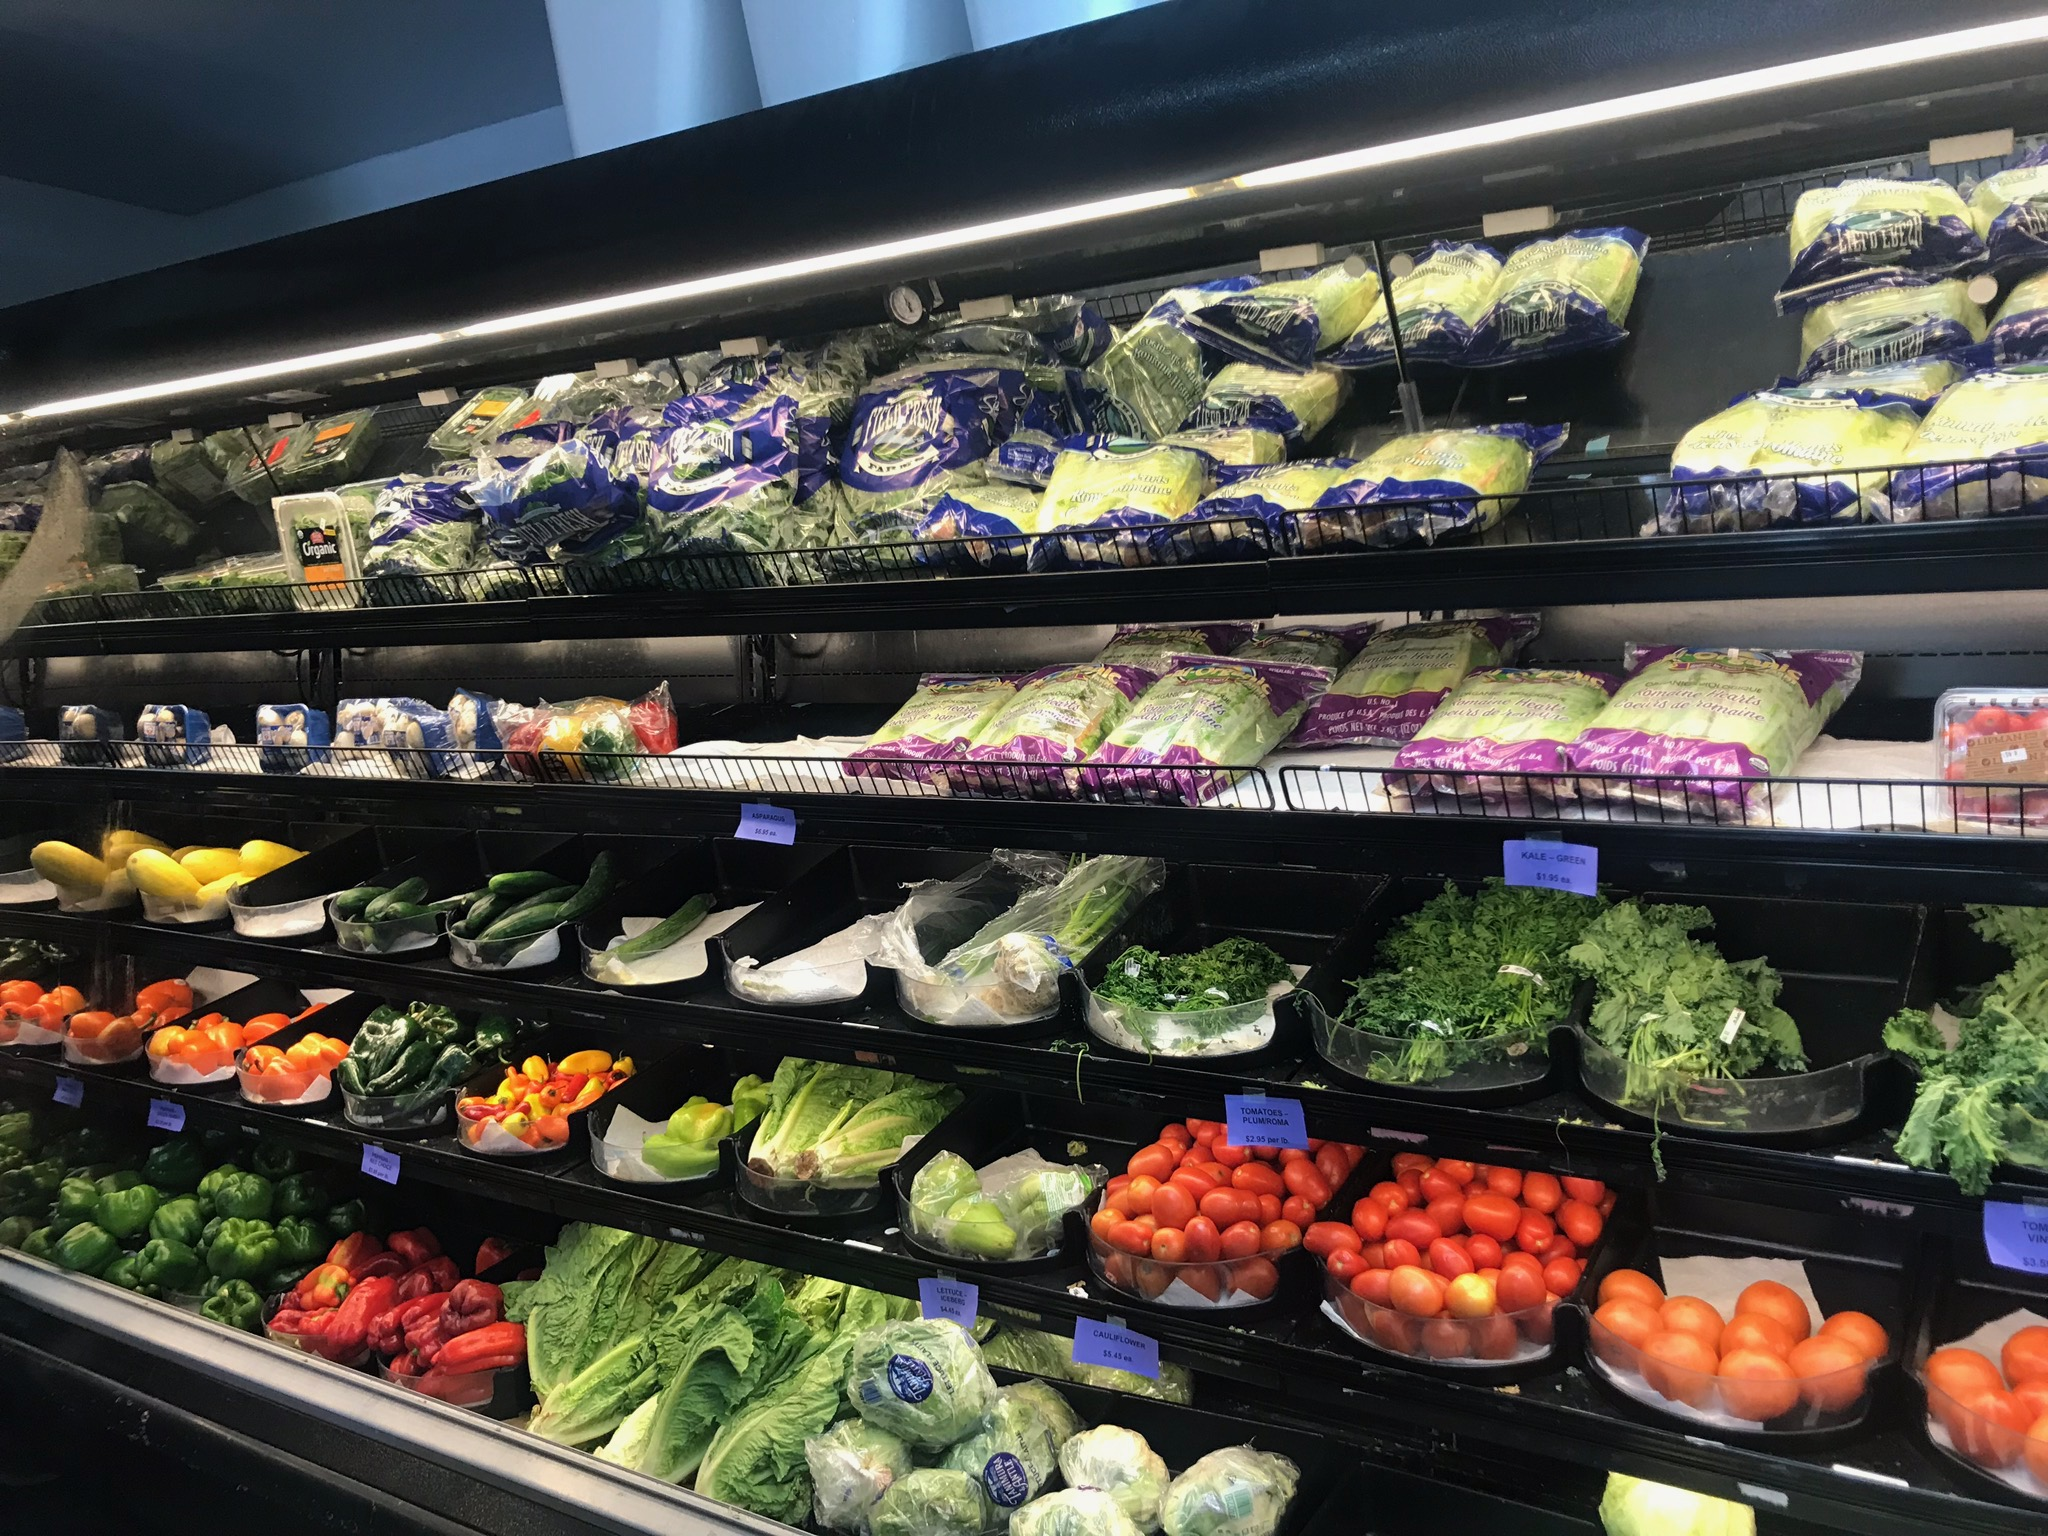 dolphin-market-st-john-produce-aisle.jpg